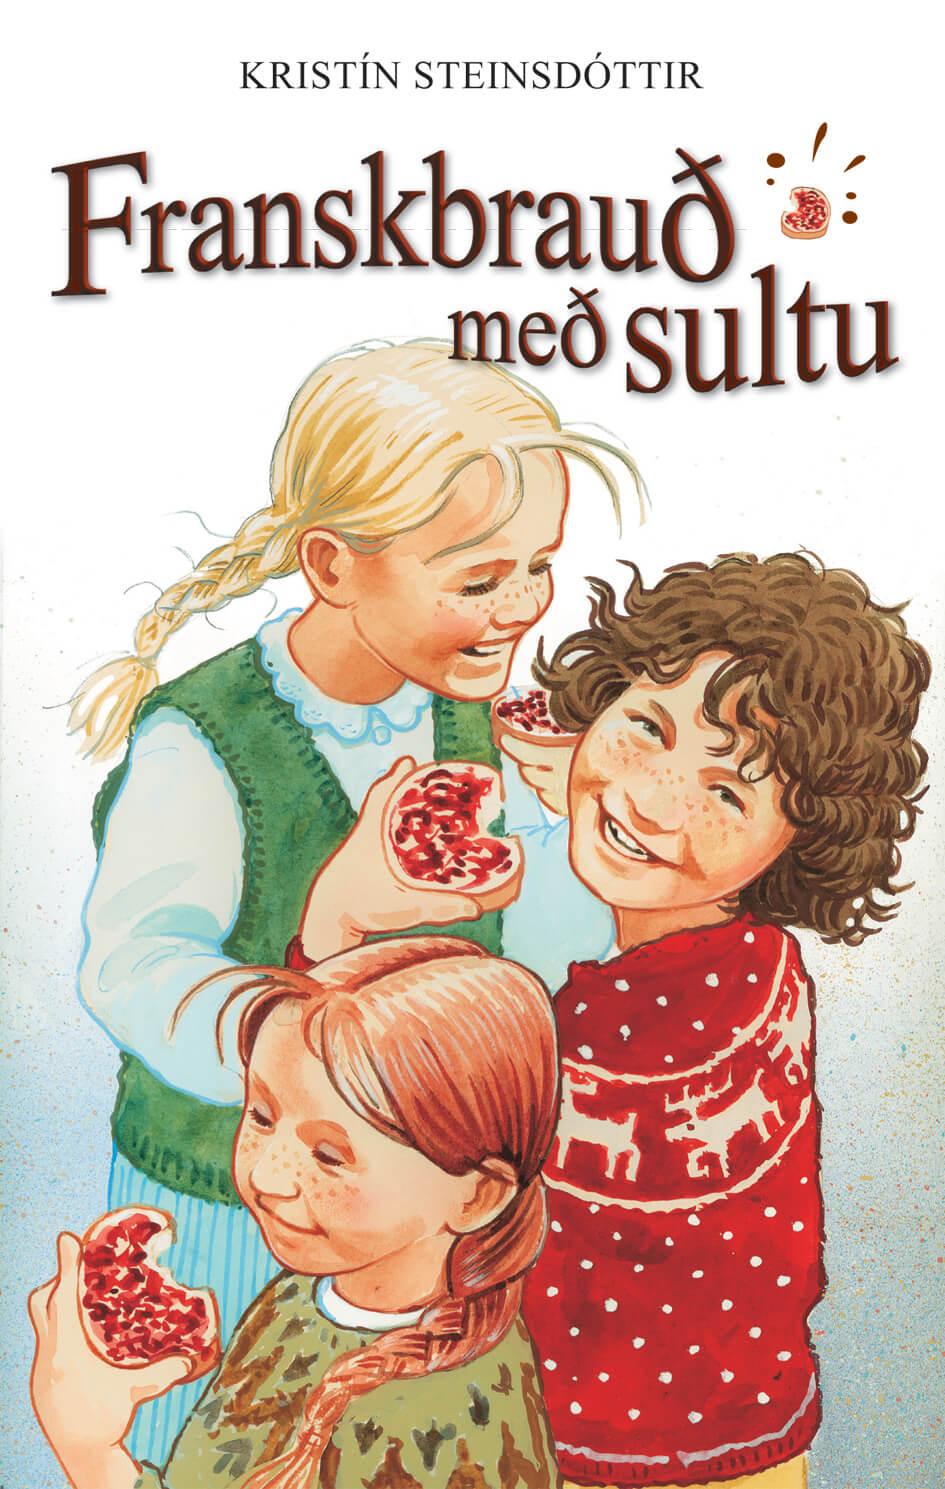 Sólin sest að morgni